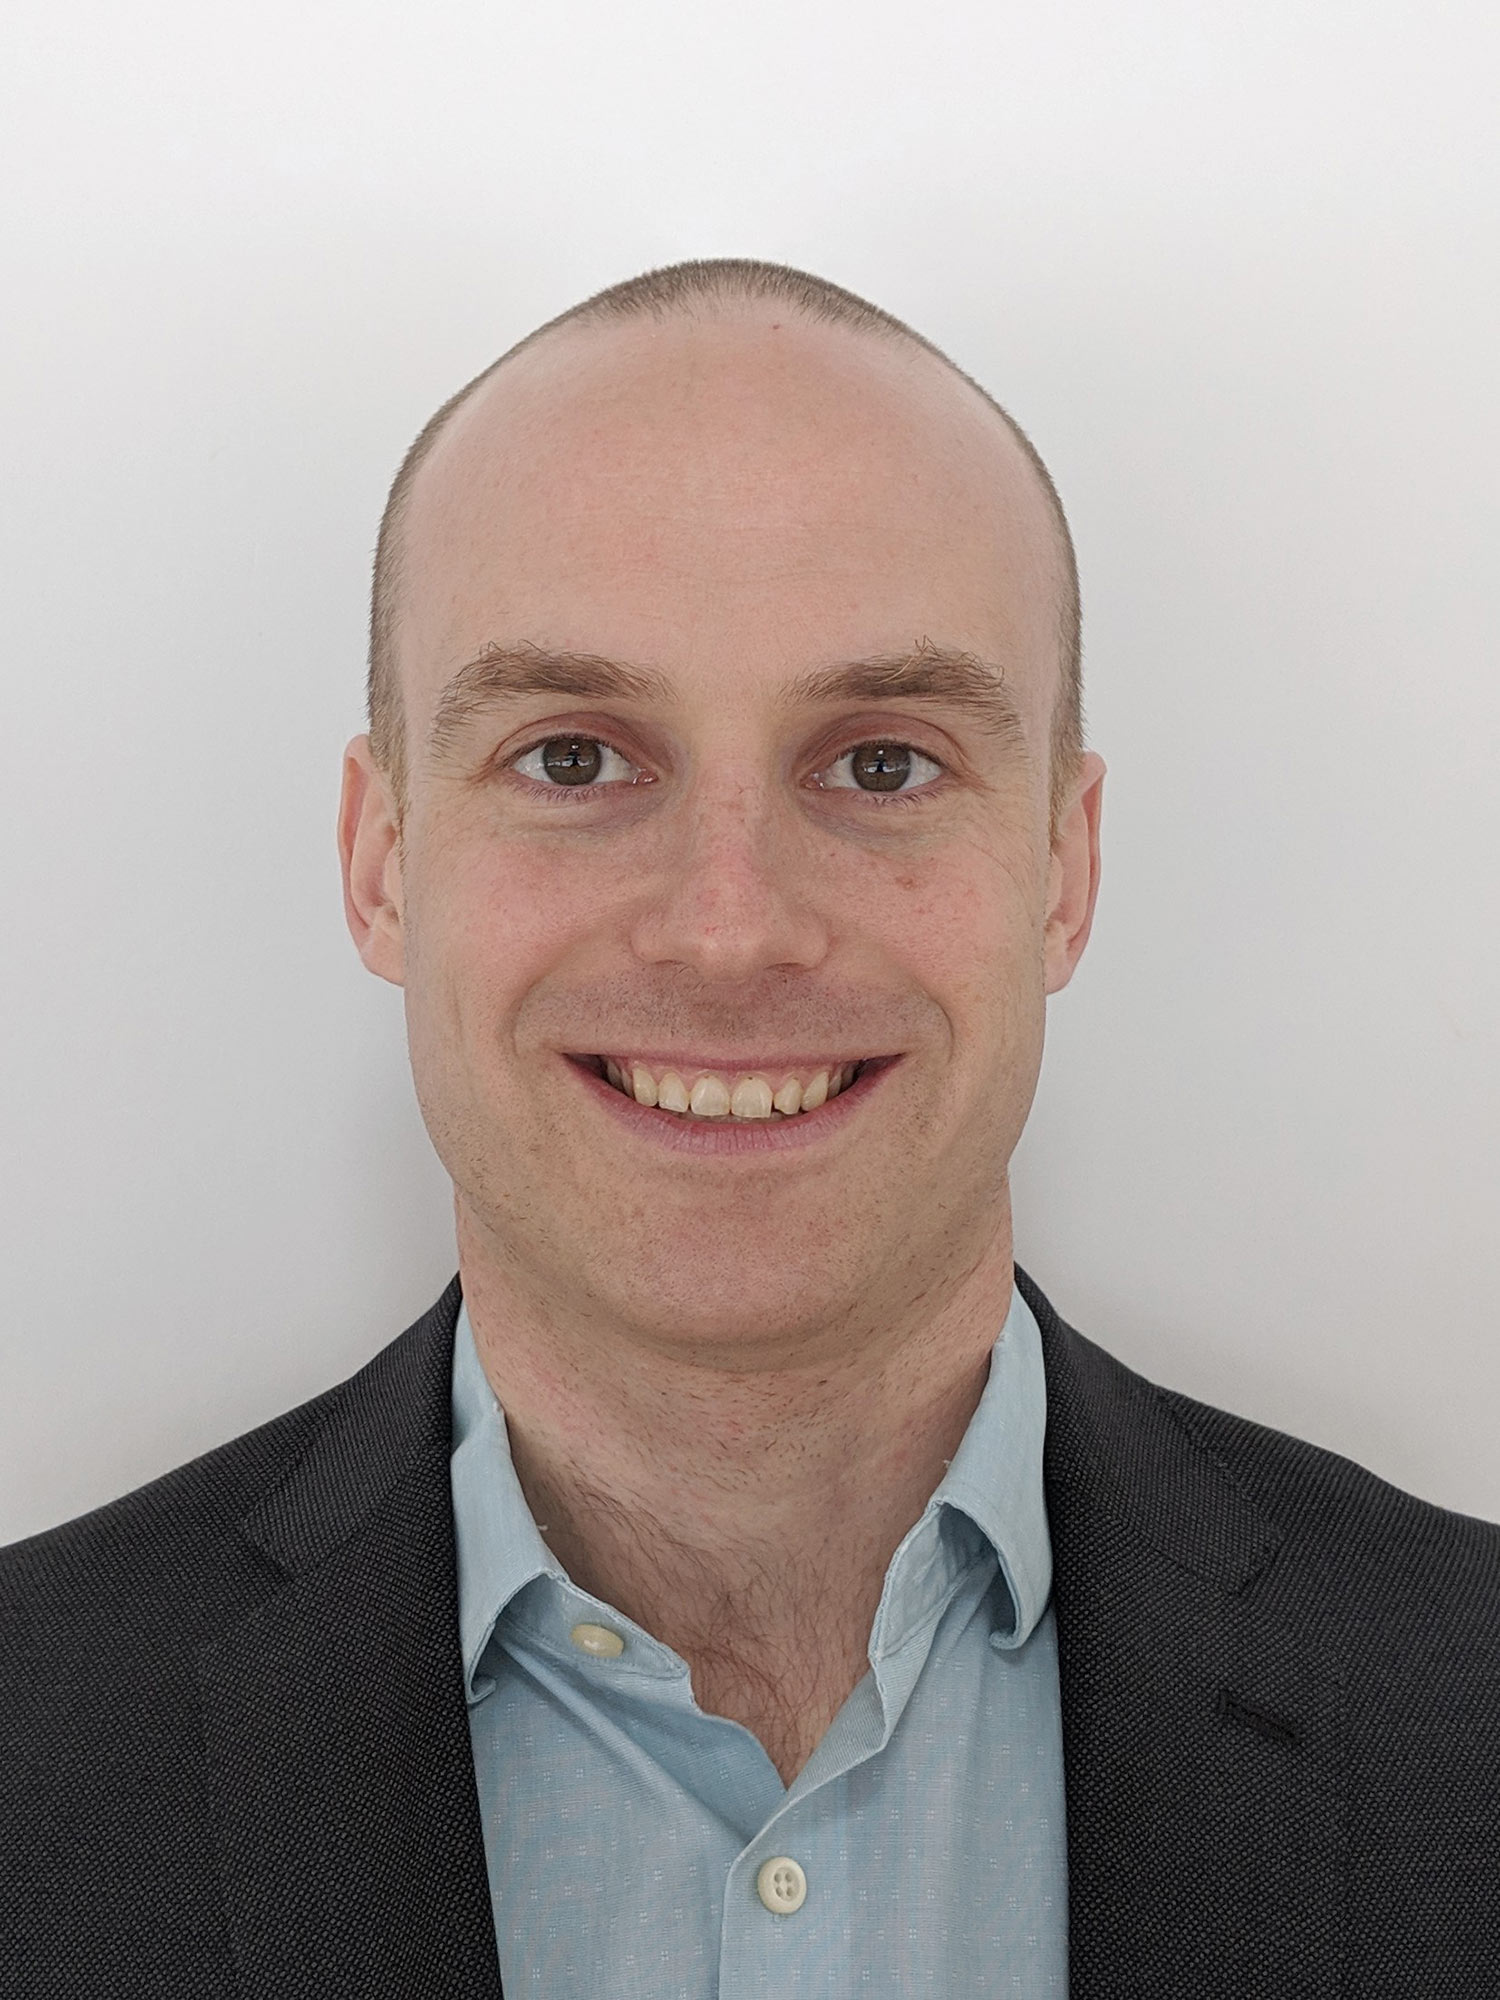 Headshot of Adam Fox, MassMutual's head of data, in a blue jacket and light blue button-down shirt.